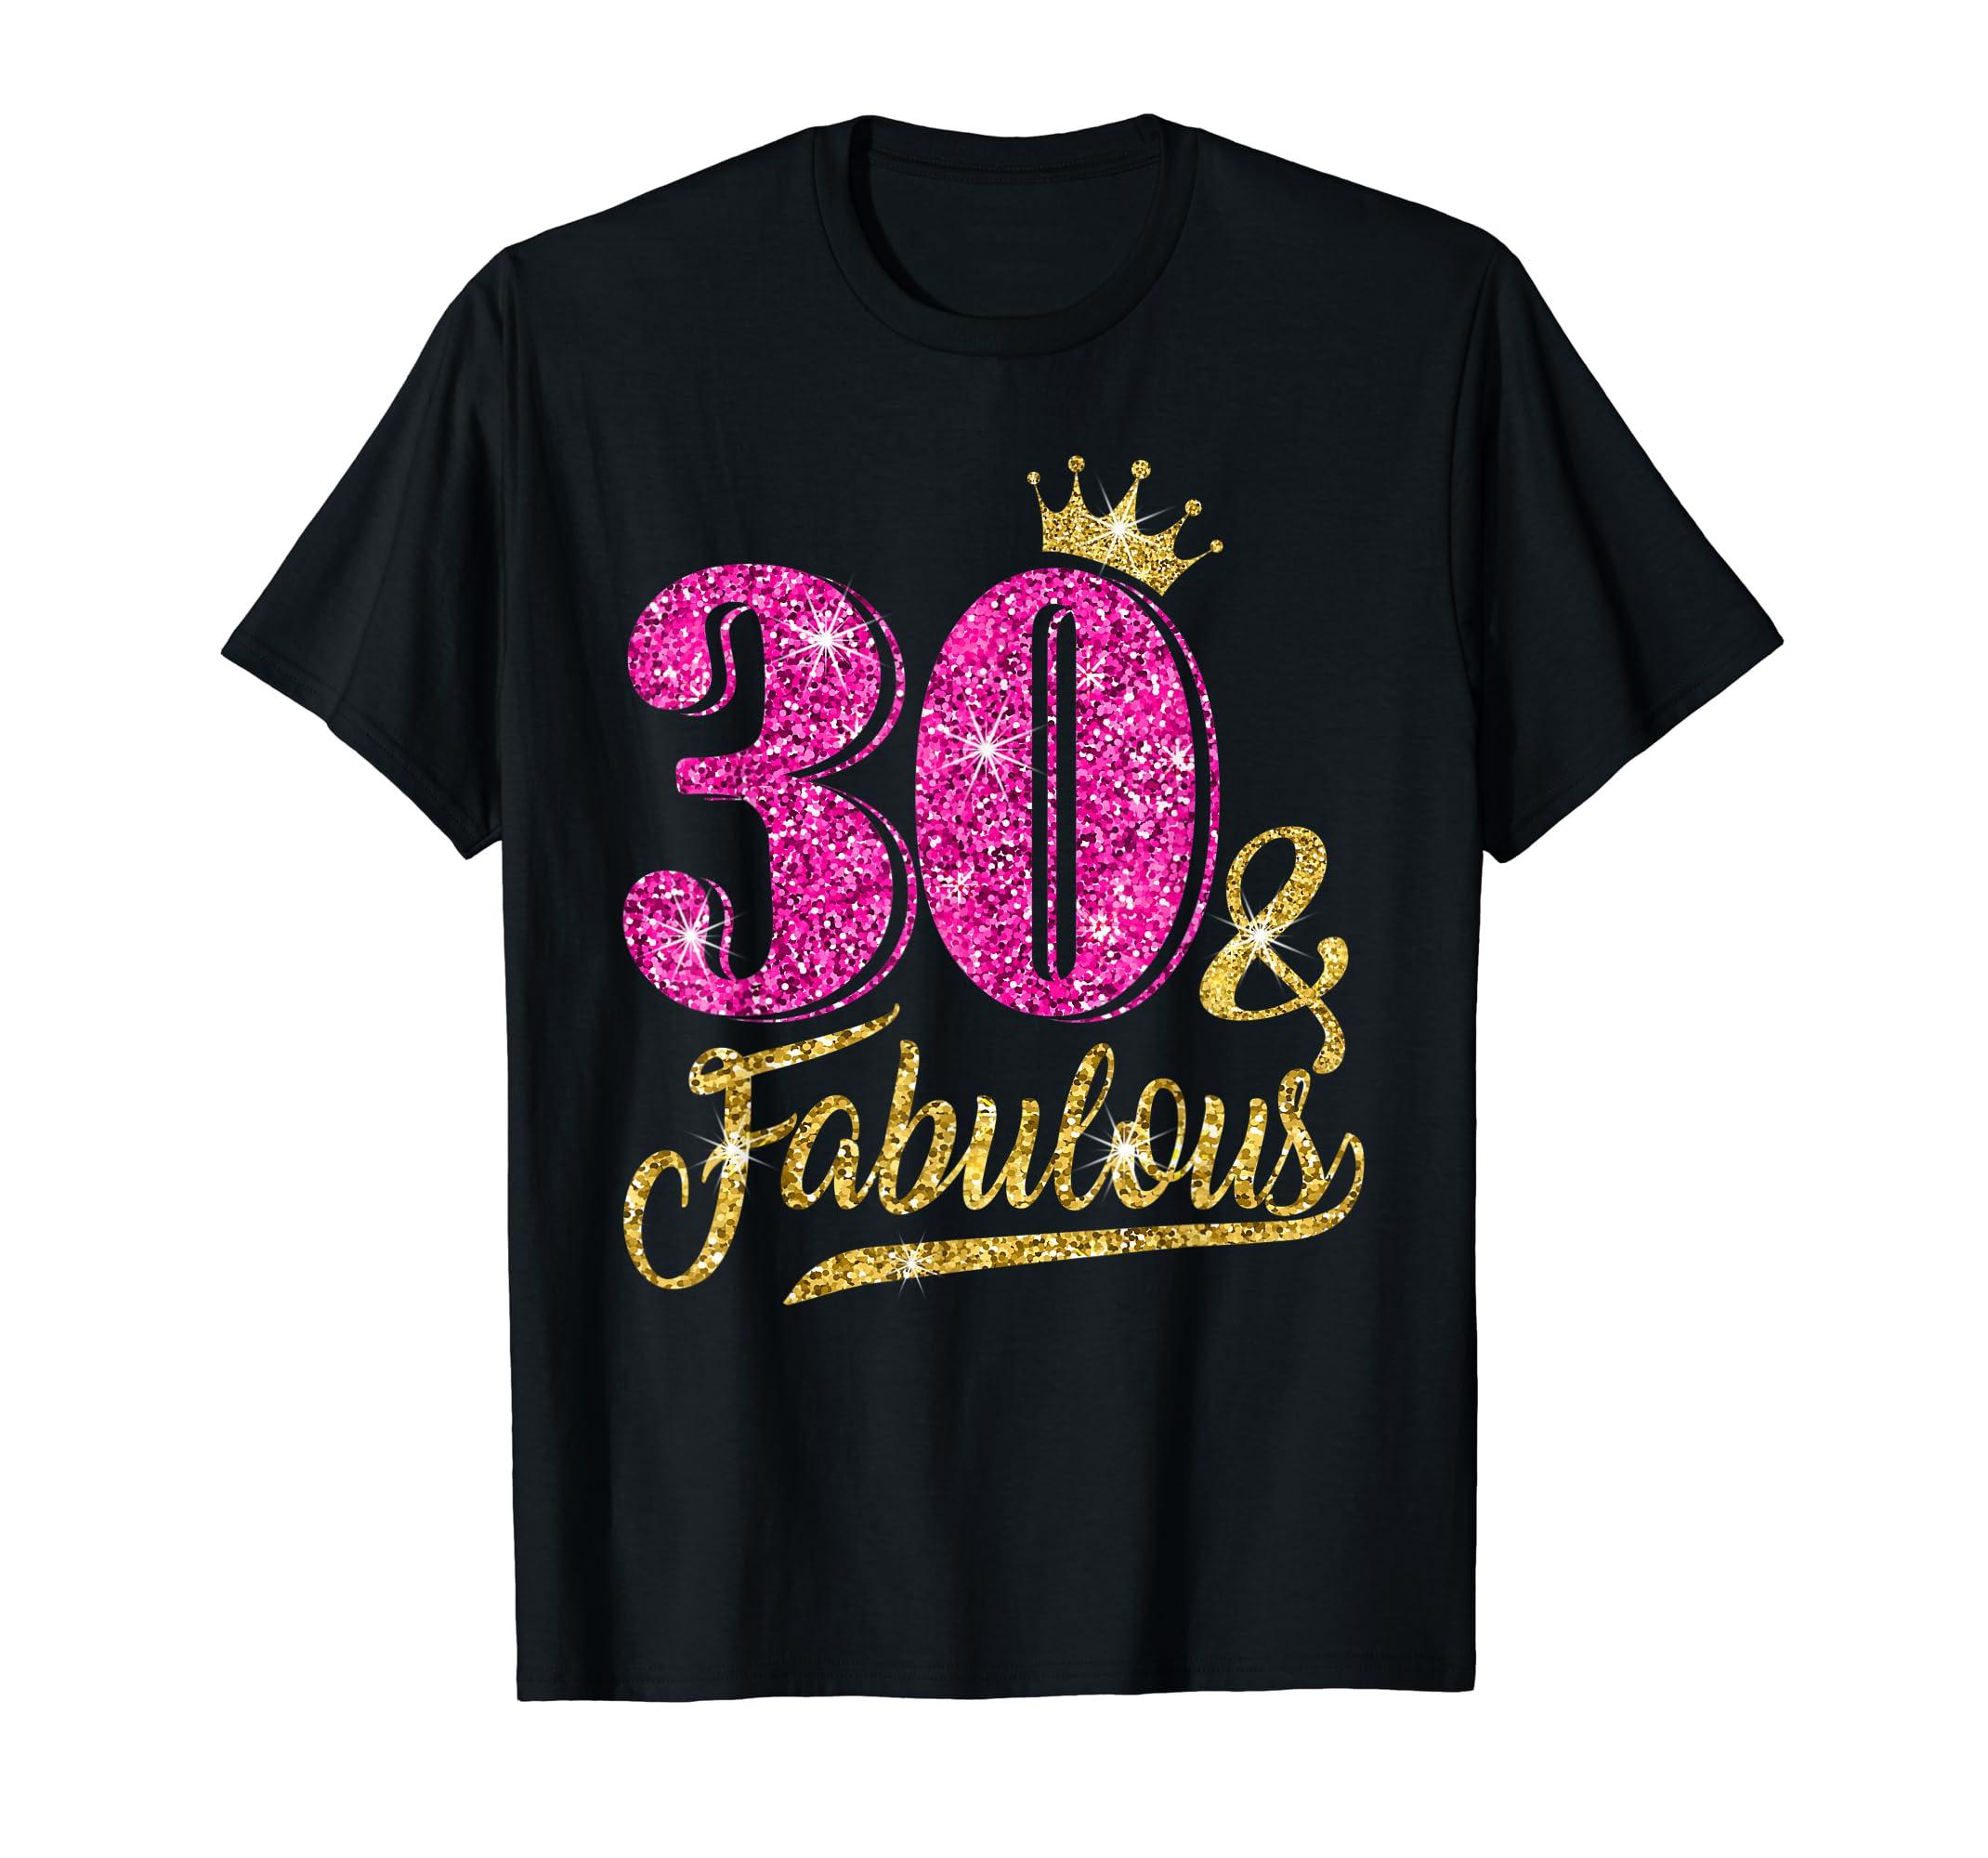 30 and Fabulous T-Shirt 30th Birthday Crown pink Gift Women-Men's T-Shirt-Black